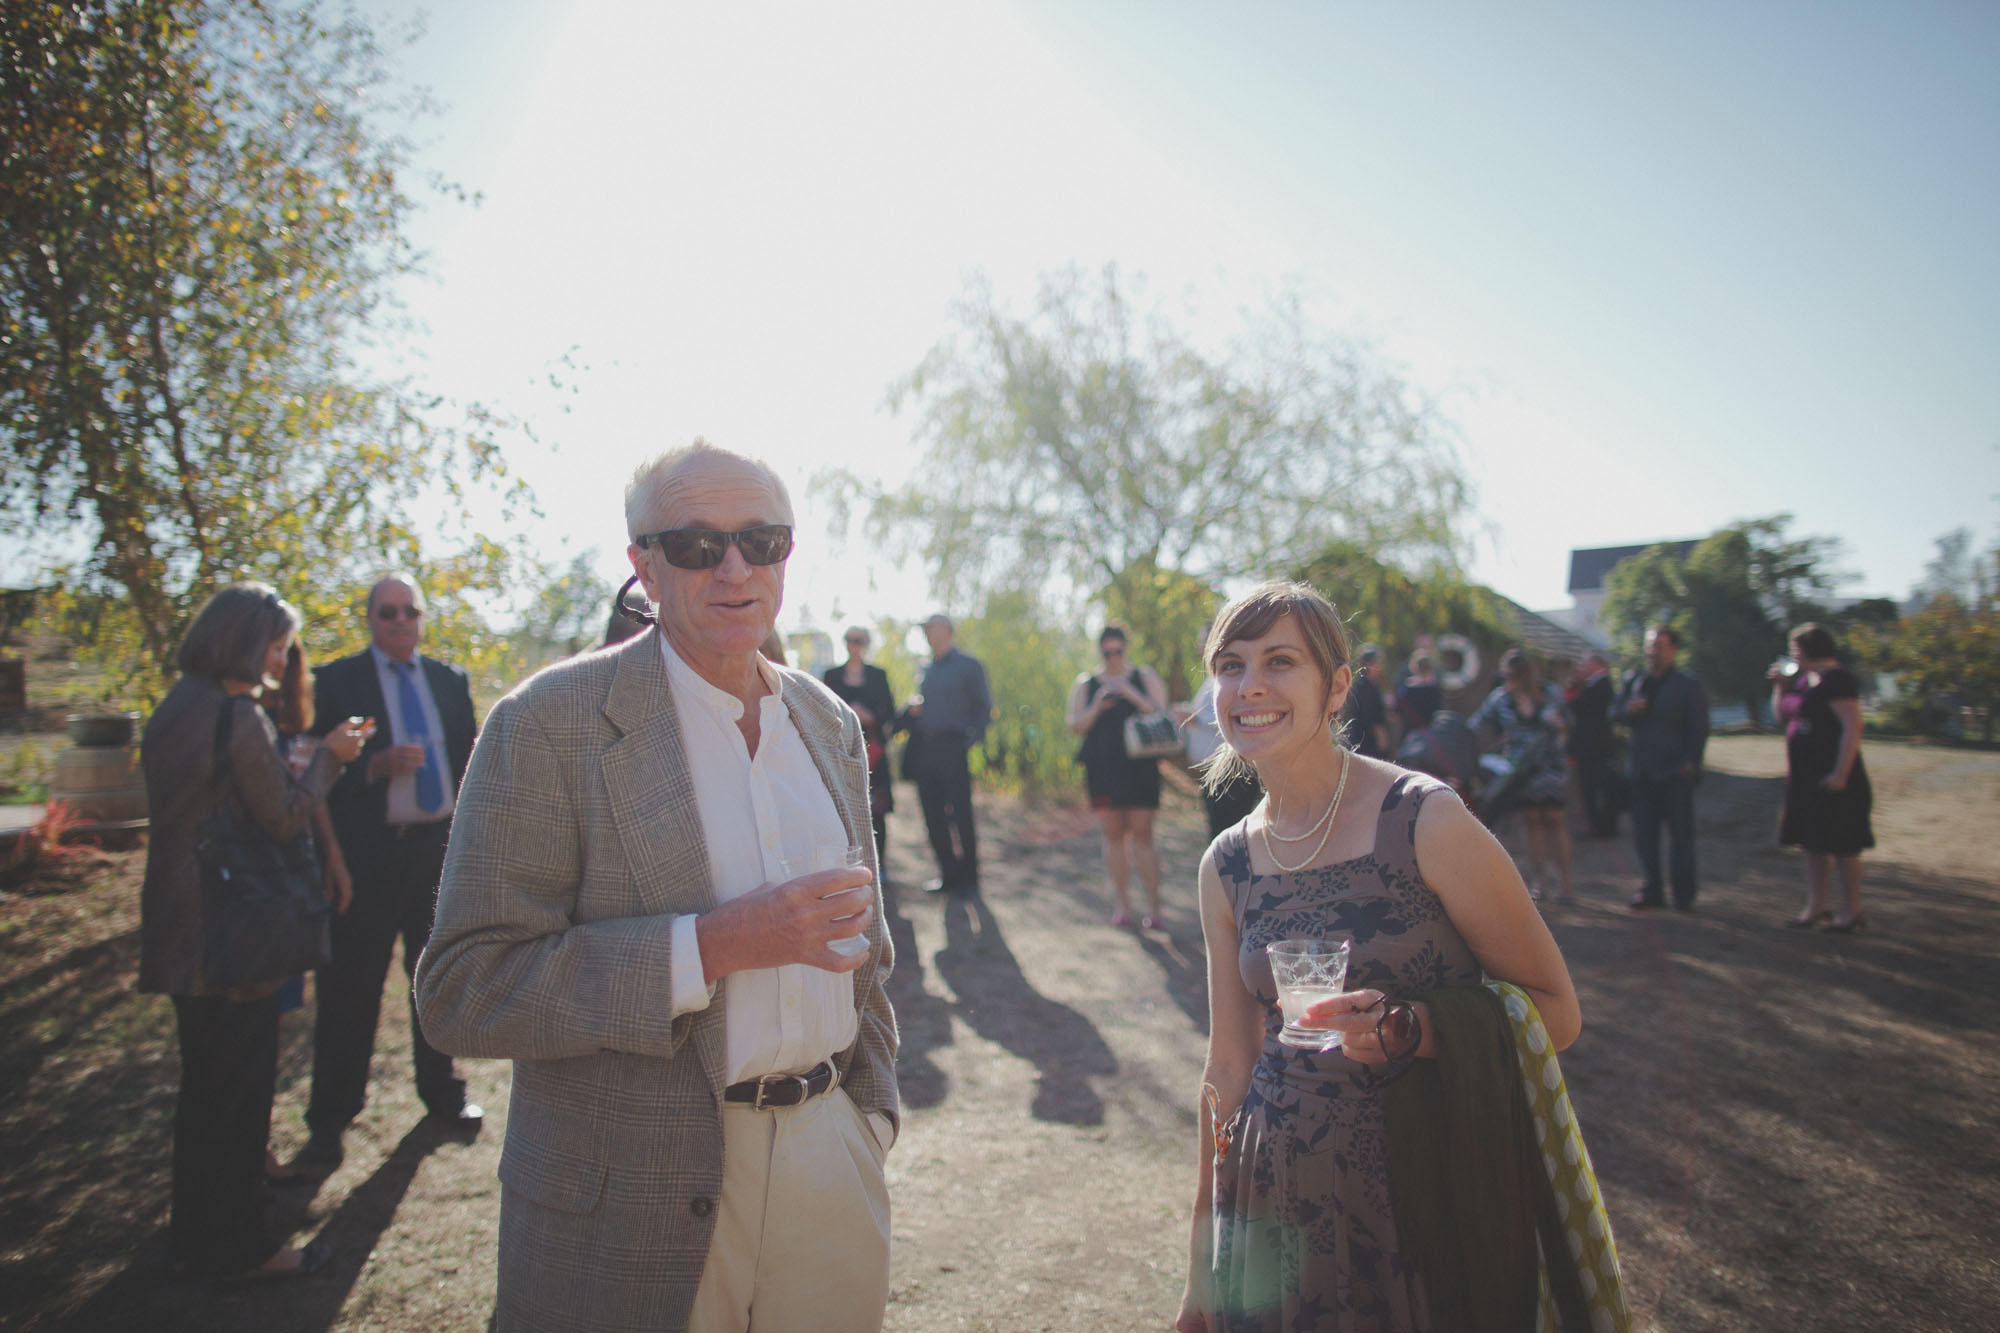 Gretchen_Gause_Petaluma_Olympias_Valley_Wedding_Photo-130.jpg